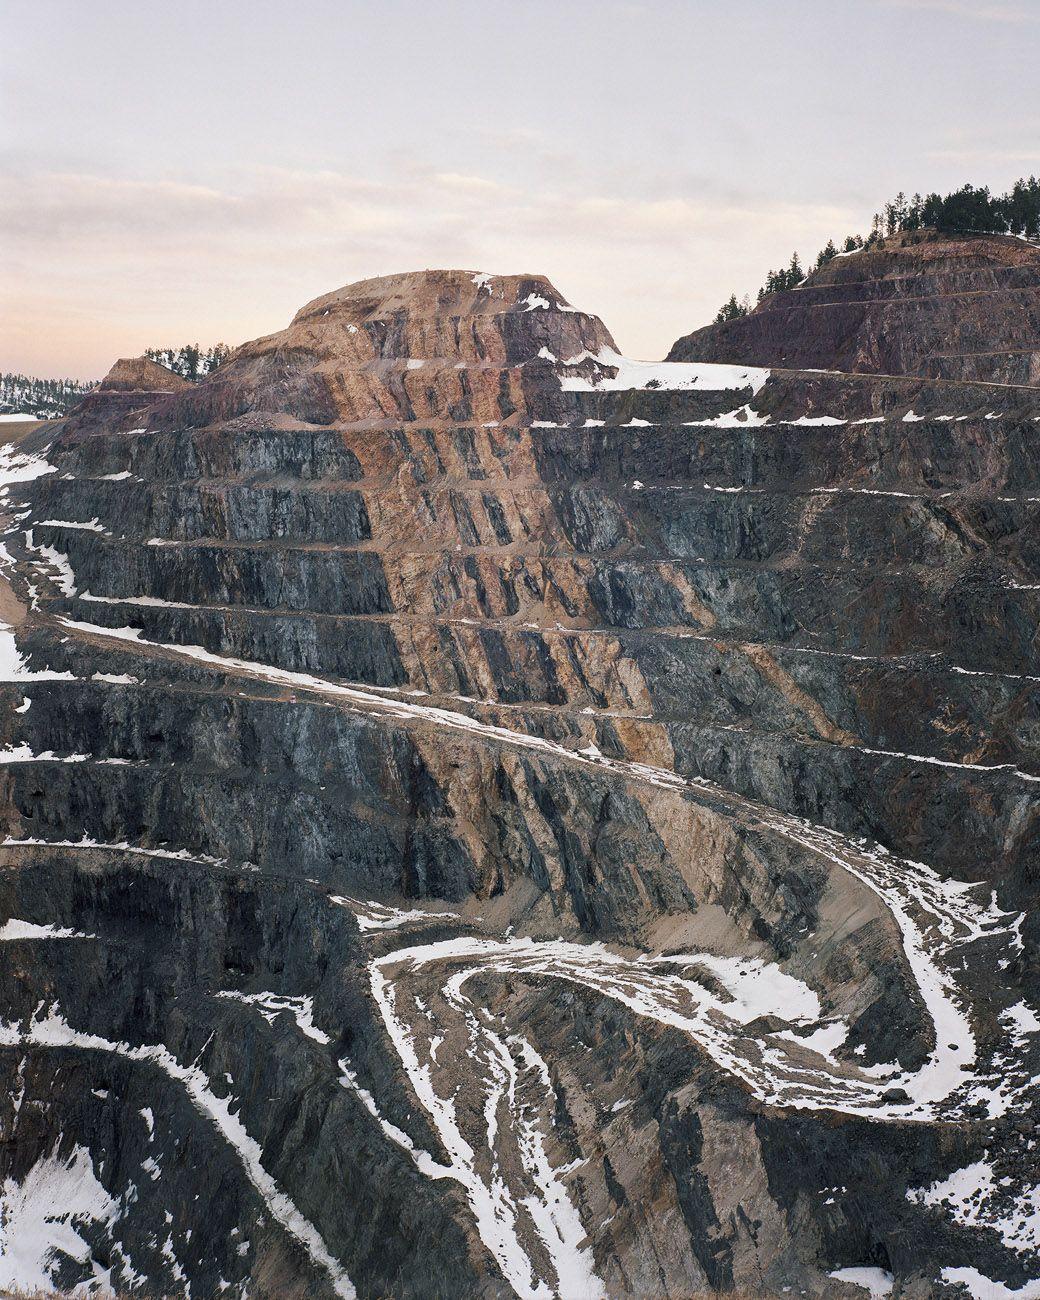 Bryan Schutmaat: Grays the Mountain Sends — Thisispaper — What we save, saves us.